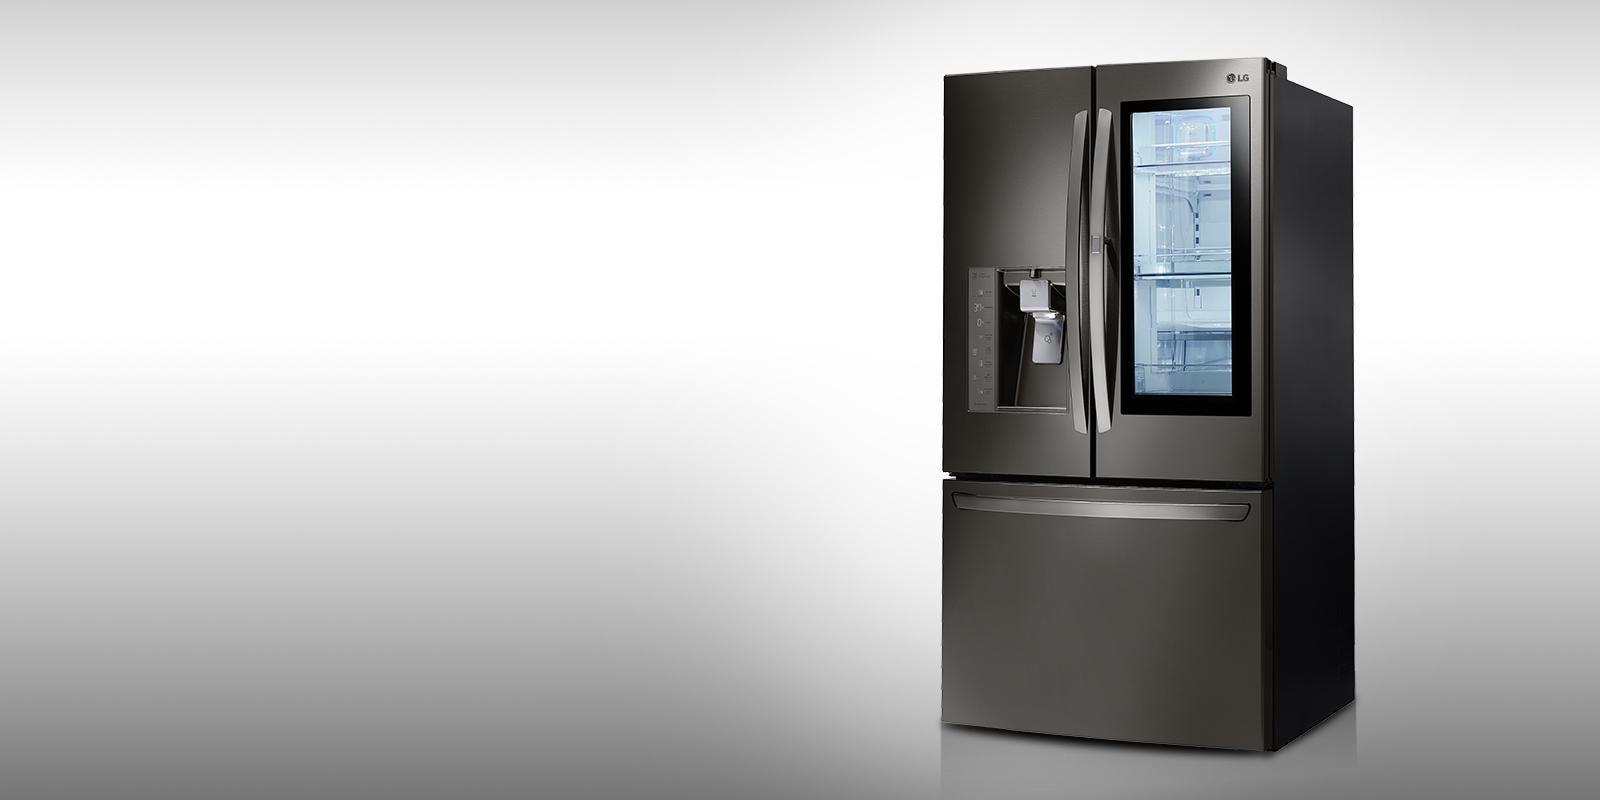 Raid the Fridge Without Losing Your Cool & LG LFXS30796D: 30 cu. ft. InstaView Door-in-Door Refrigerator | LG USA